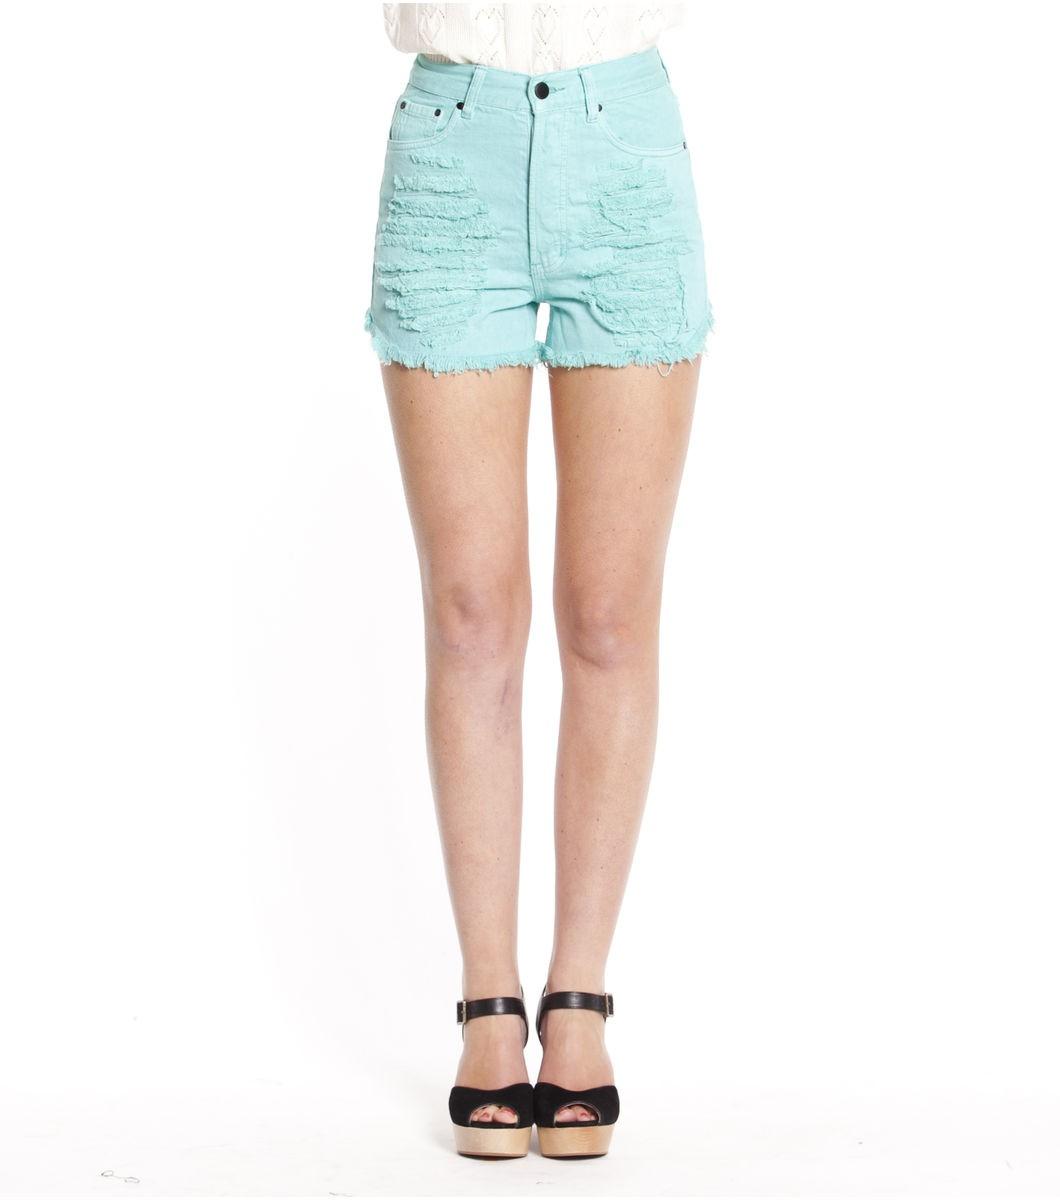 New Harley Shorts